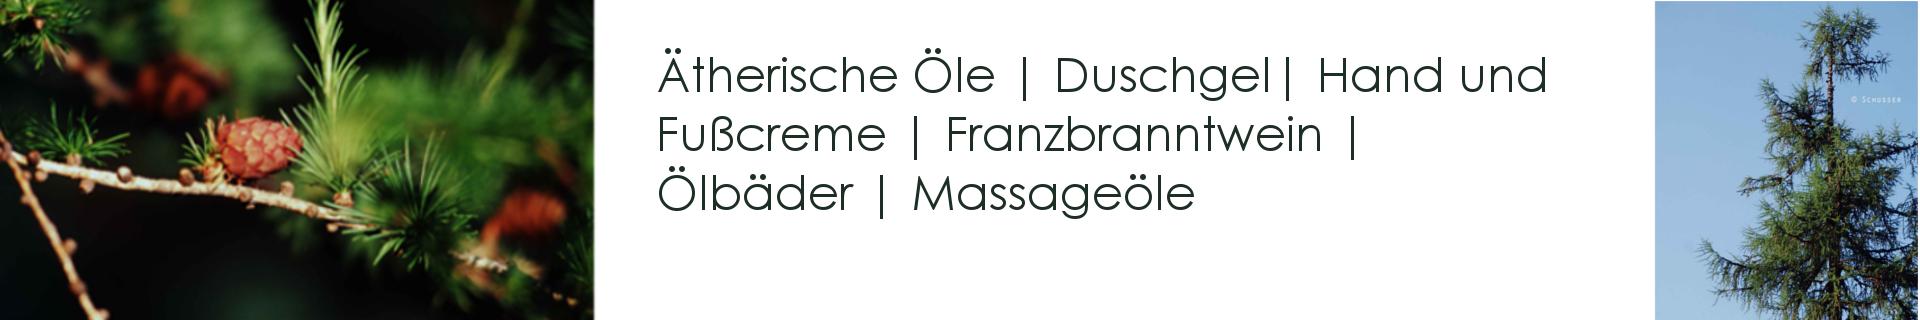 SchusserOG_HP_Slider_Produktgruppen